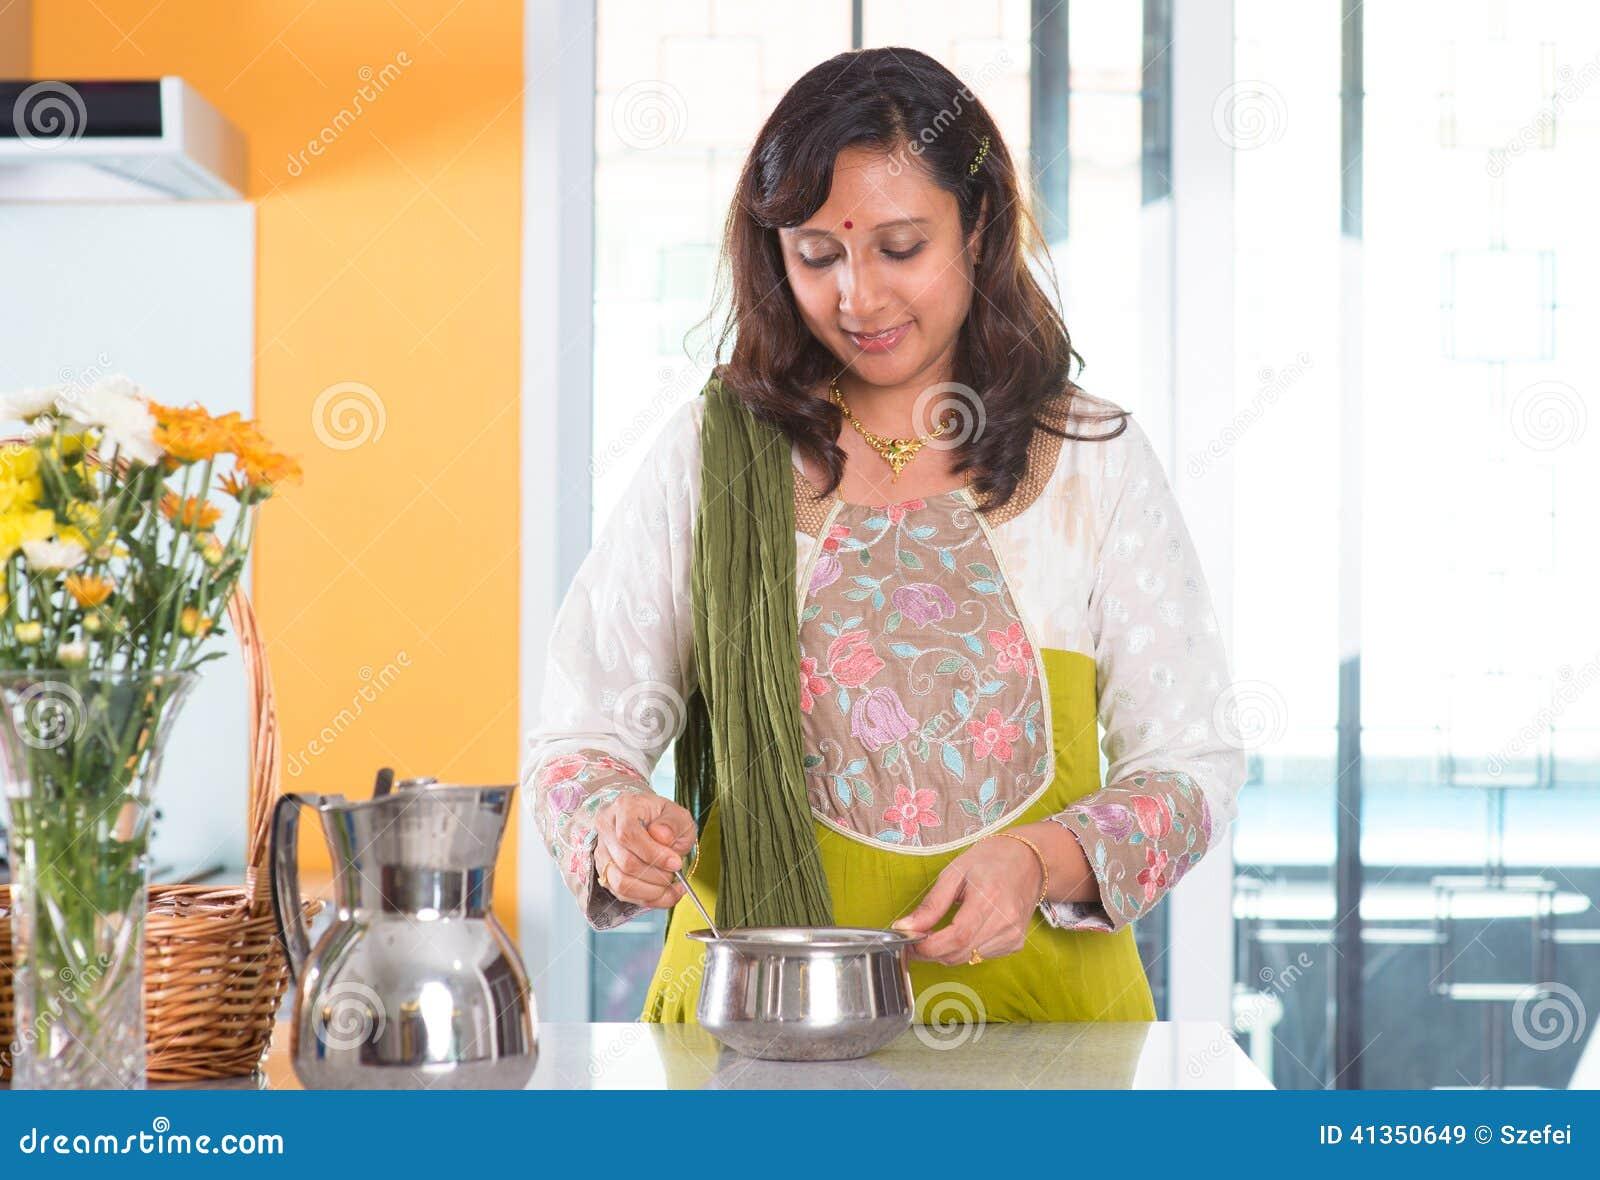 Indian Housewife Preparing Food Stock Photo - Image: 41350649